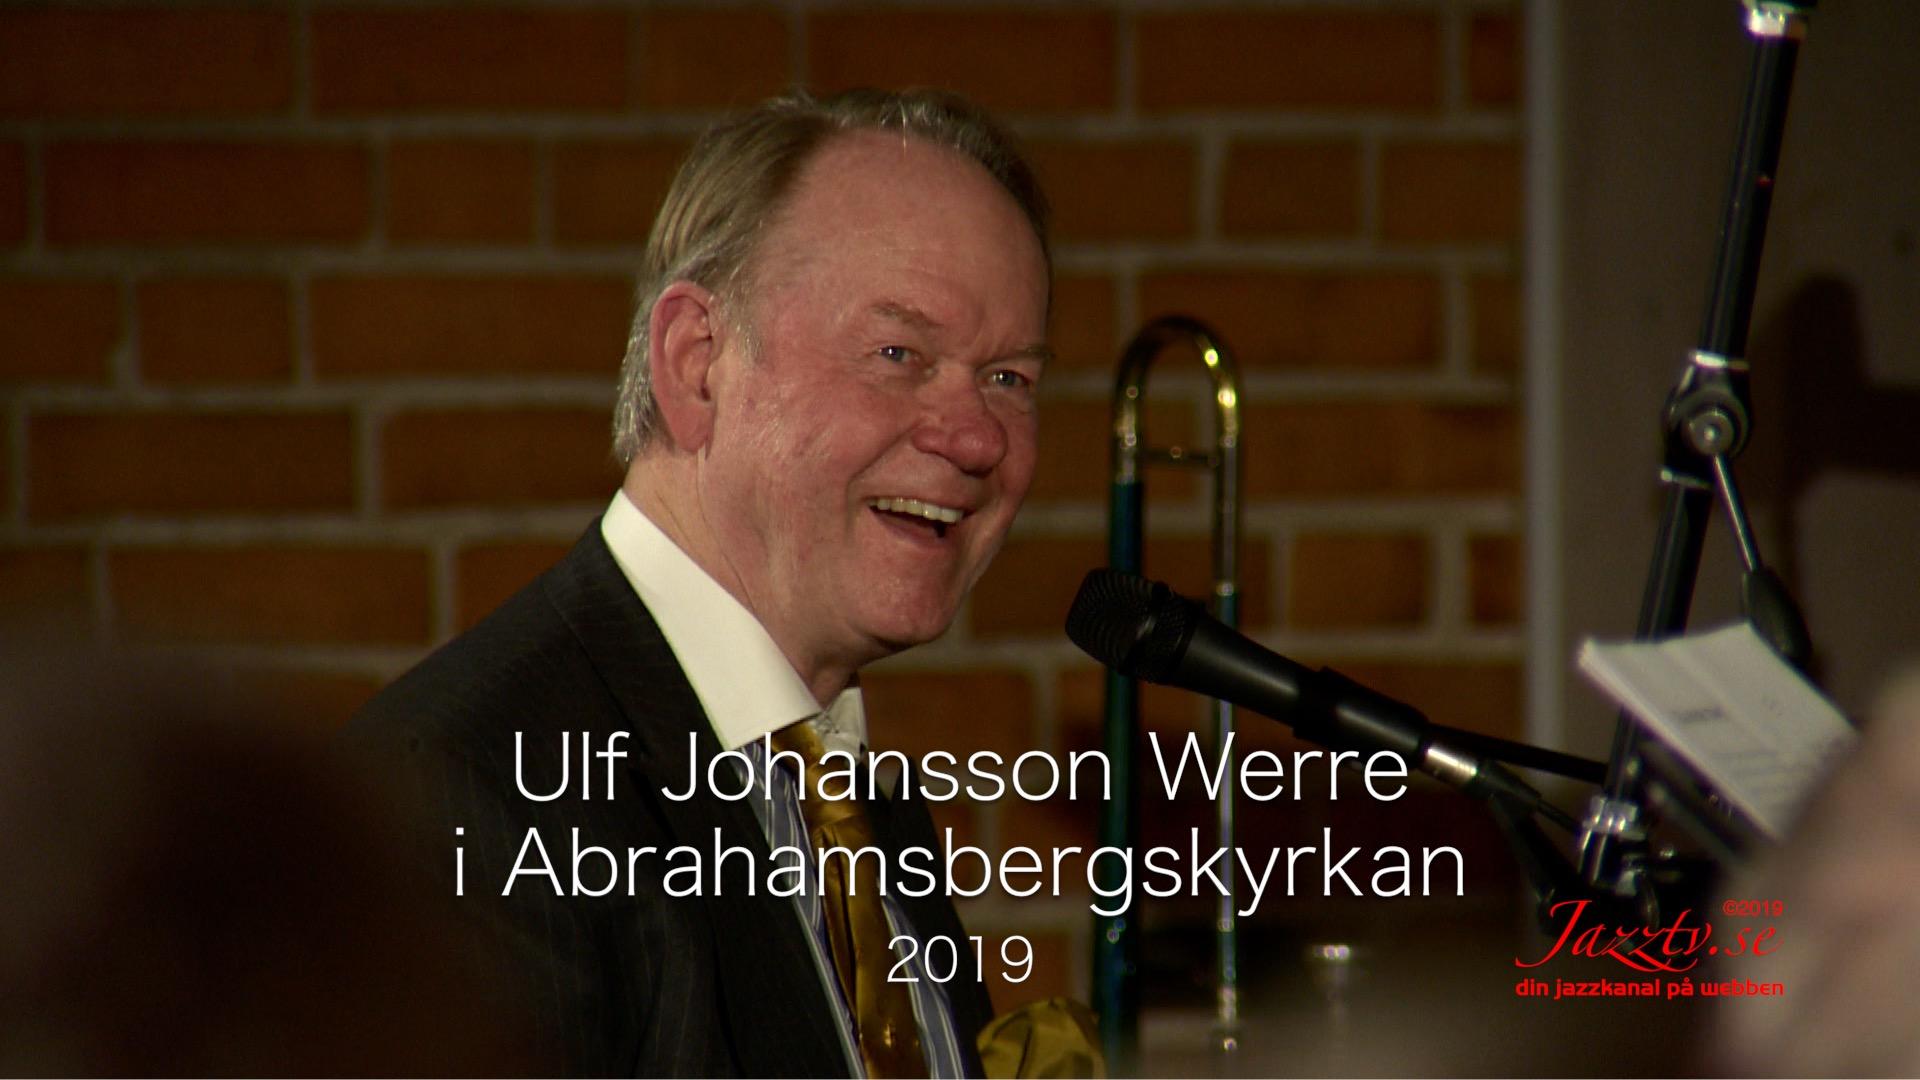 Ulf Johansson Werre i Abrahamsbergskyrkan